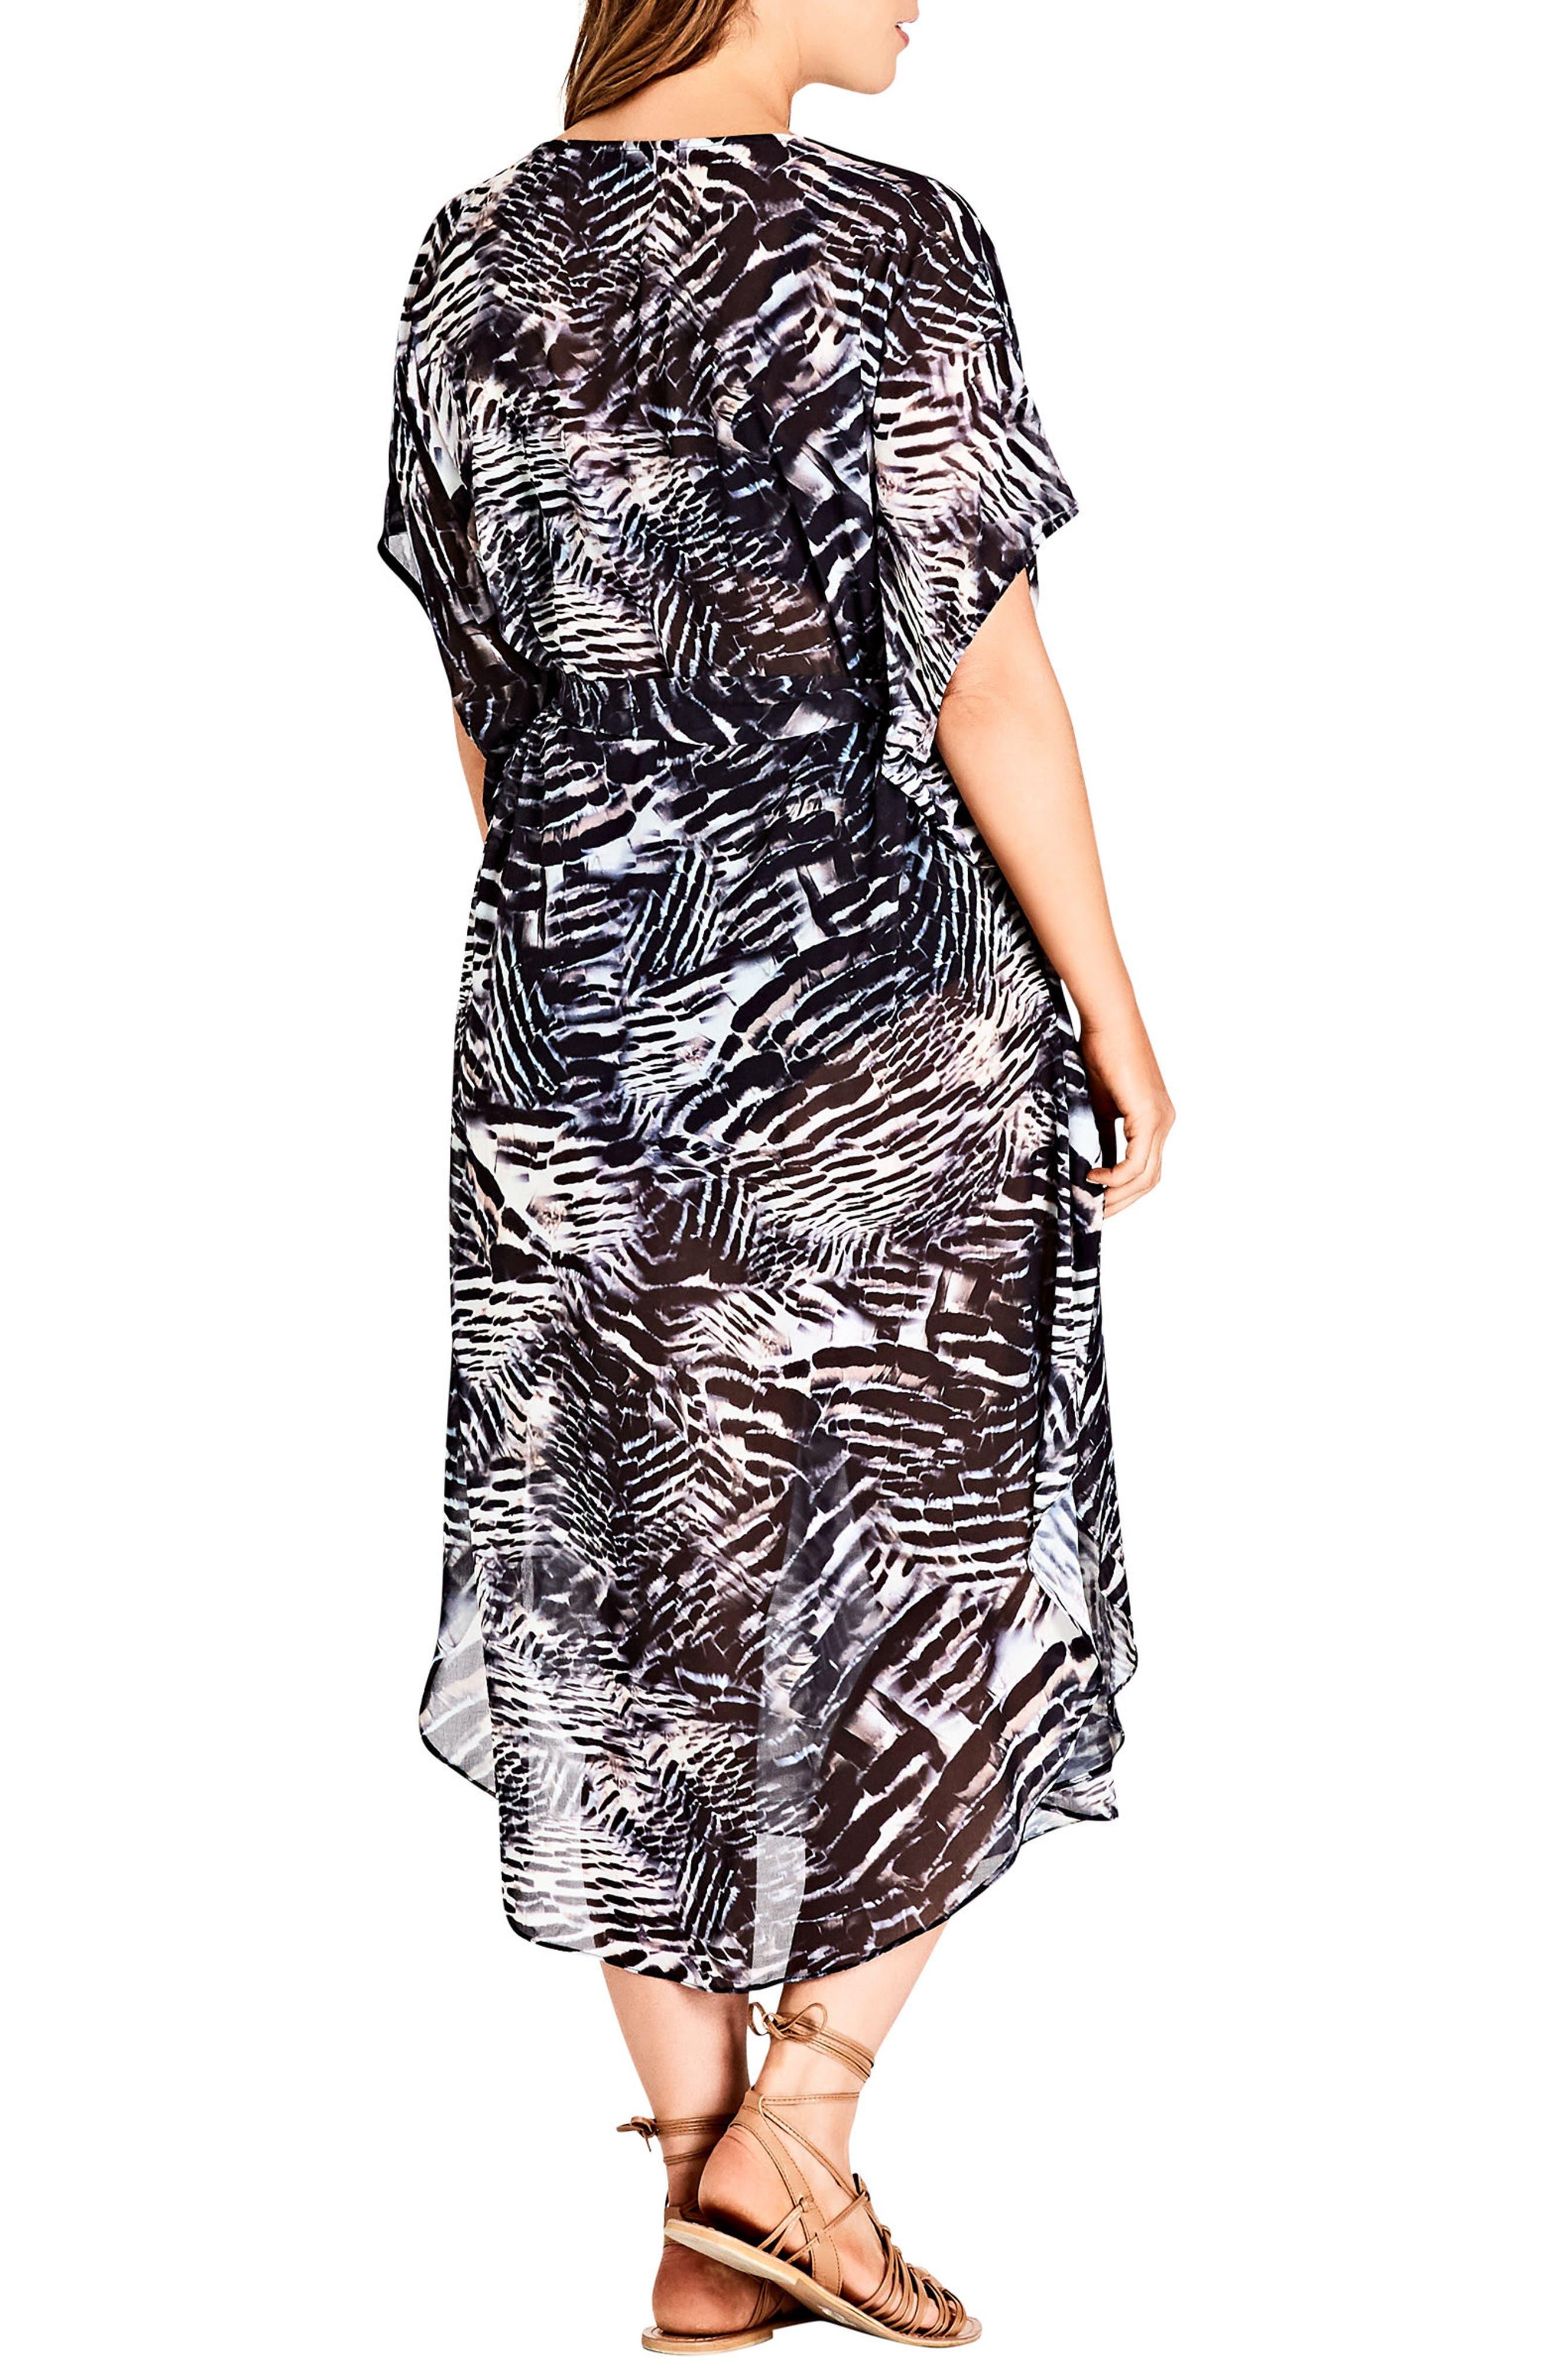 Sahara Caftan Dress,                             Alternate thumbnail 2, color,                             Black Print